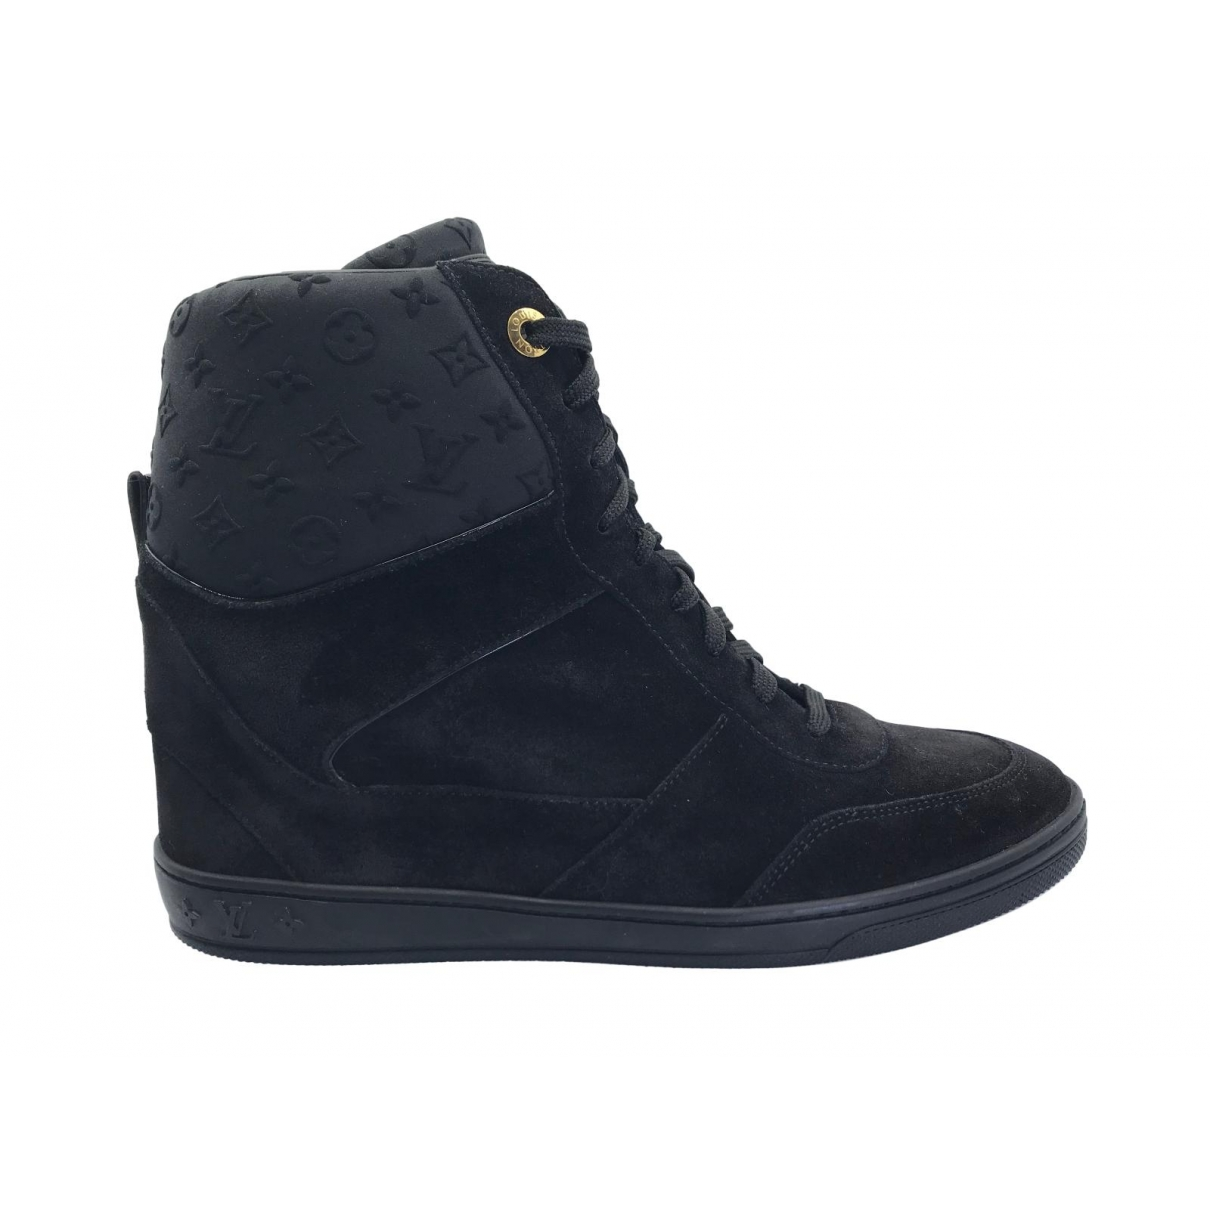 Louis Vuitton \N Sneakers in  Schwarz Veloursleder